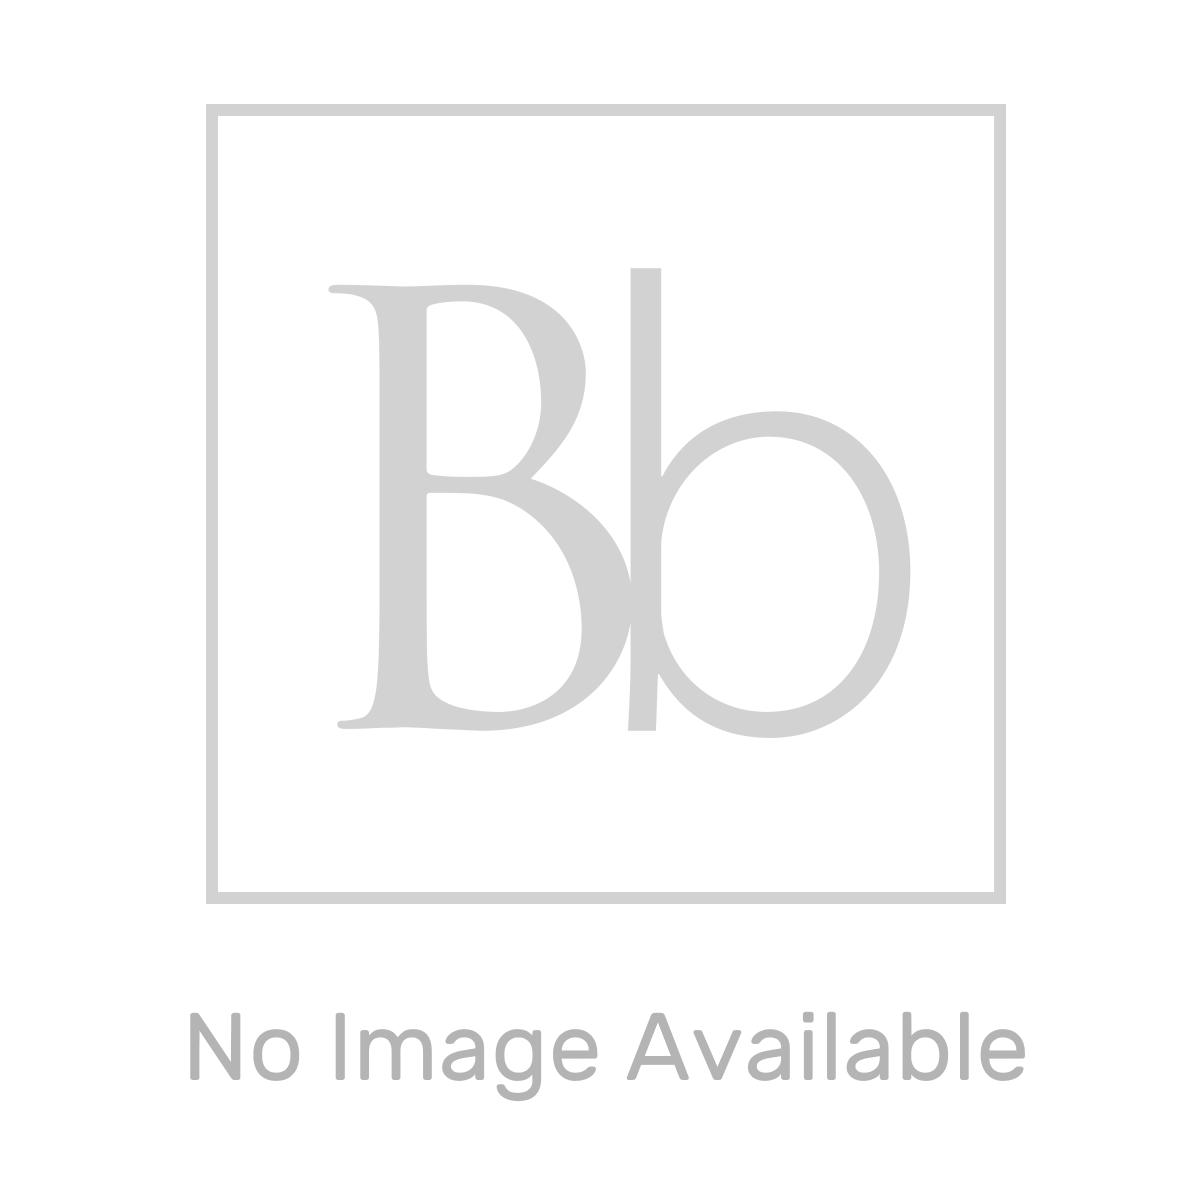 Square Anti-Slip Shower Tray 800mm x 800mm Line Drawing